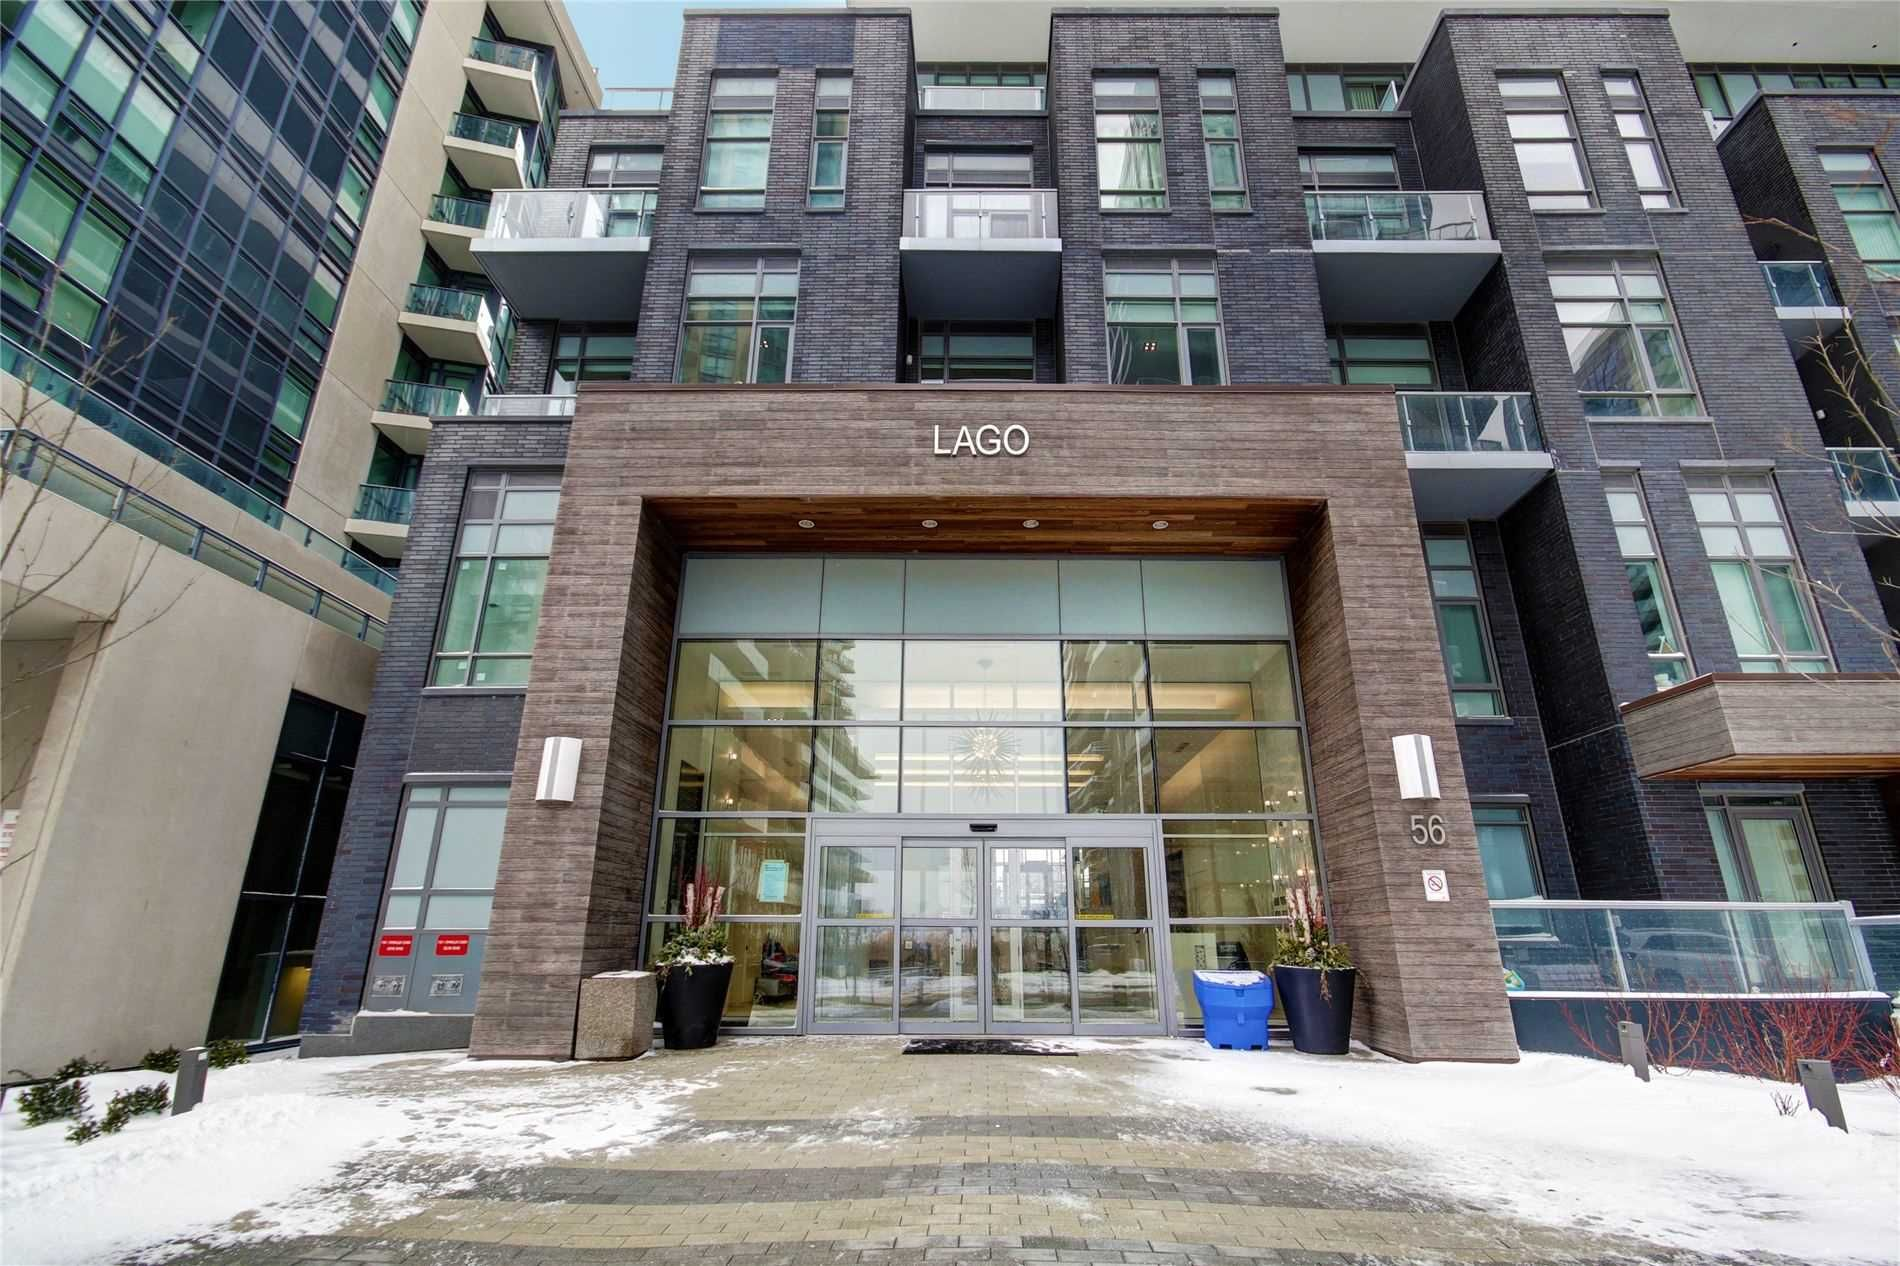 Main Photo: 3701 56 Annie Craig Drive in Toronto: Mimico Condo for lease (Toronto W06)  : MLS®# W4690932